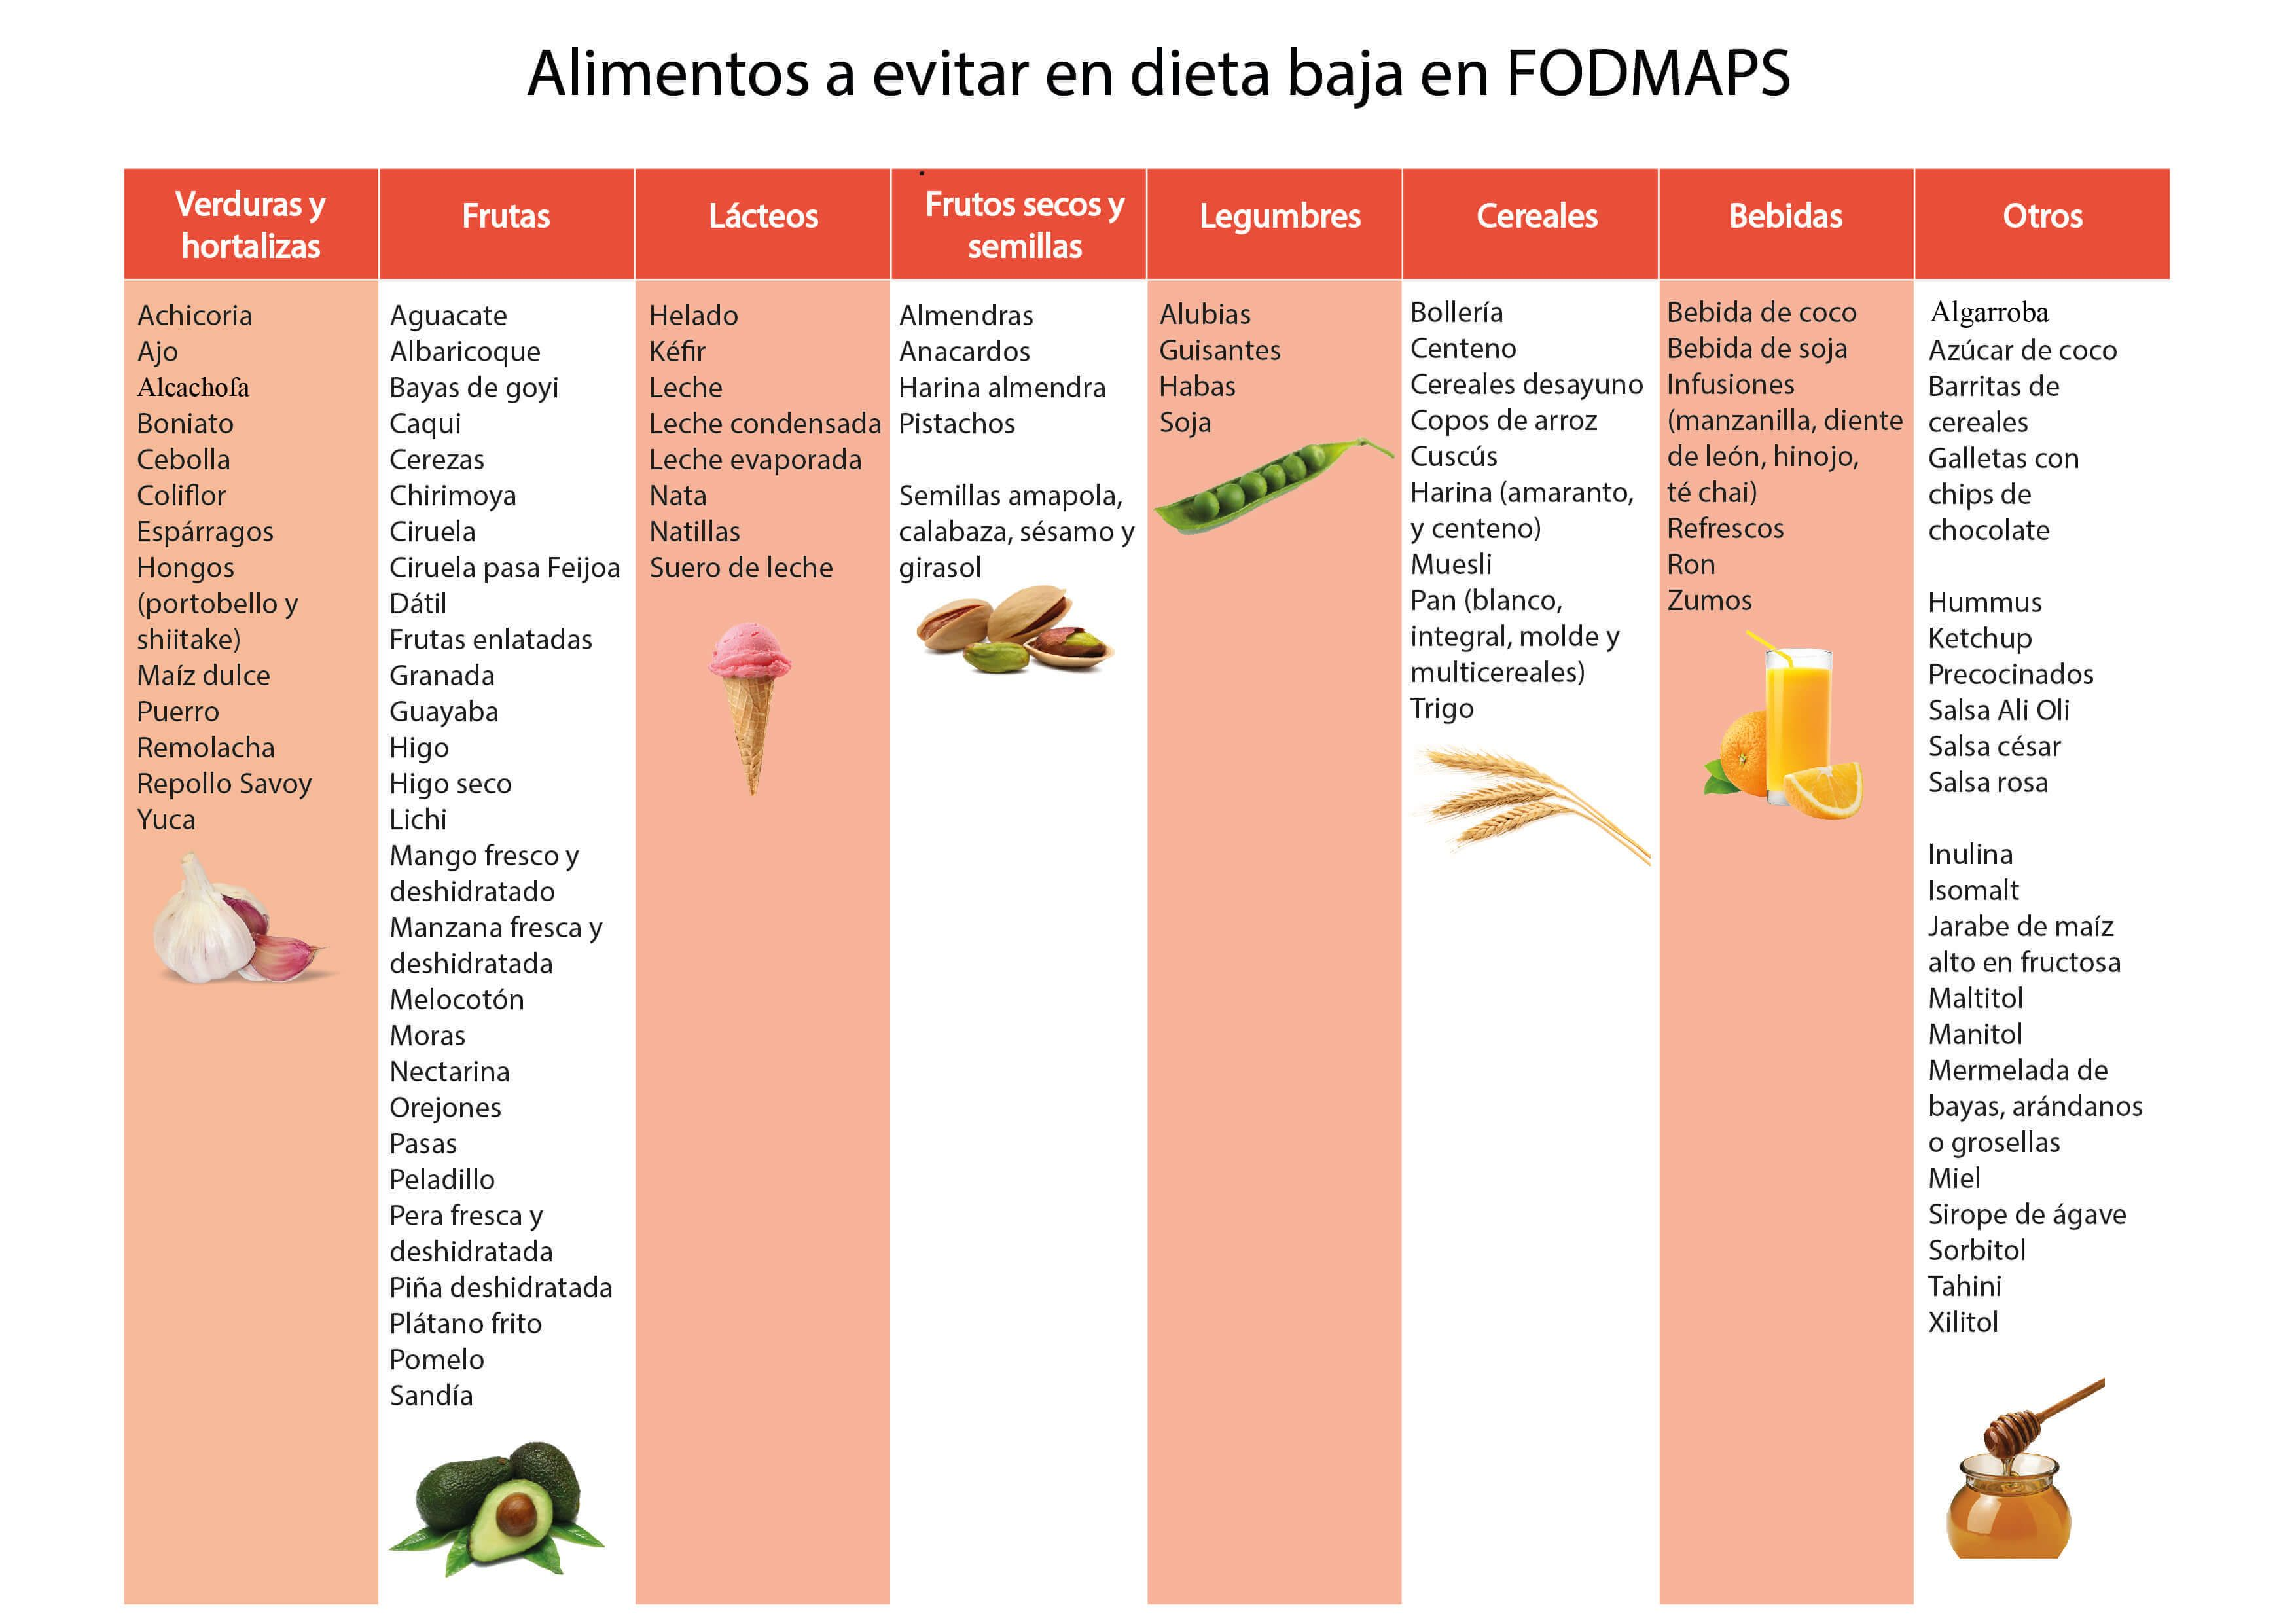 Dieta Fodmap Sin Azucares Fermentables Infografias Dieta Fodmap